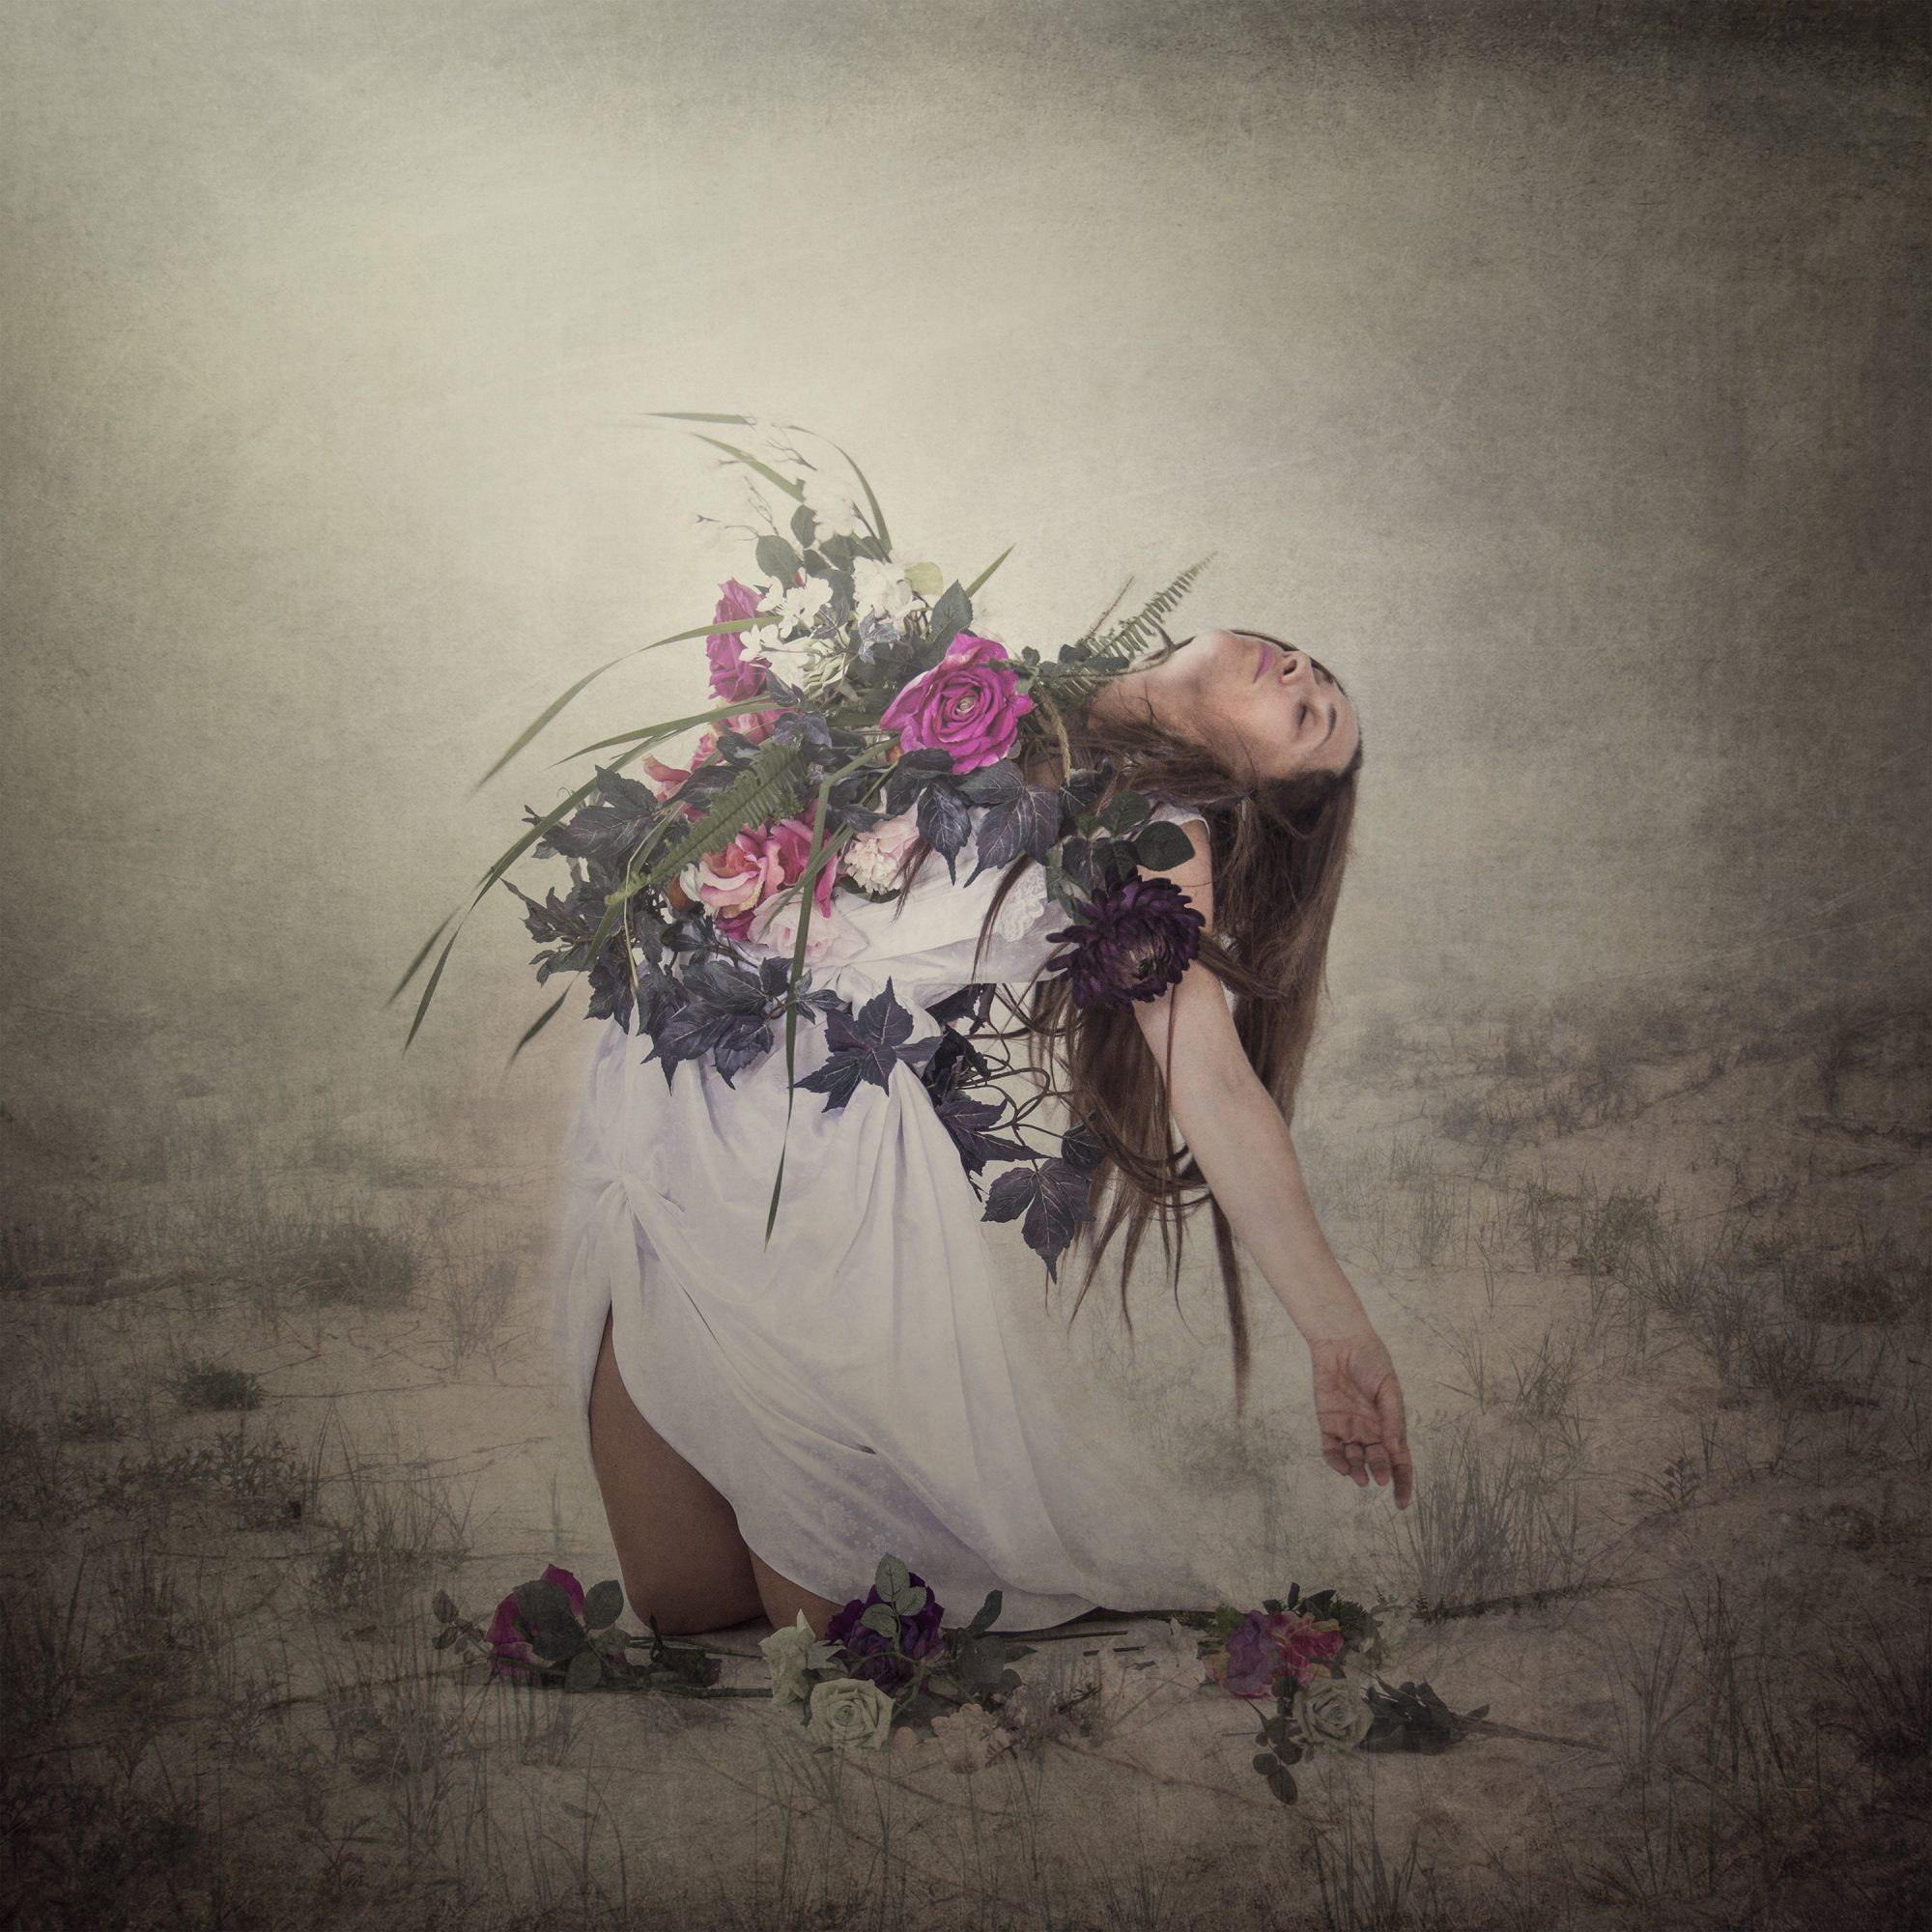 bloom-i-fine-art-photographer